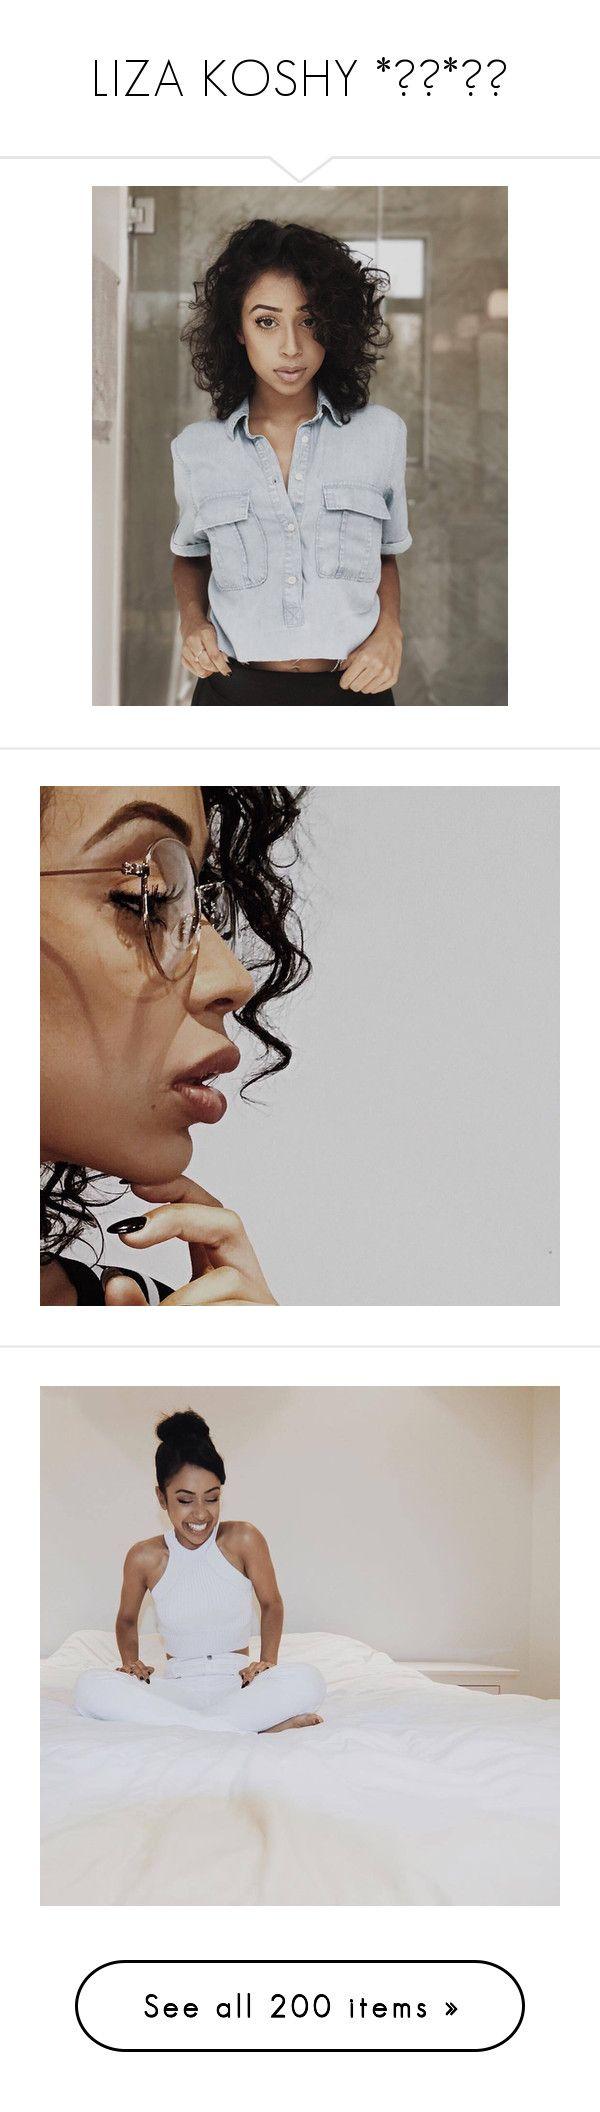 """LIZA KOSHY *✲゚*。✧"" by disney-clipper ❤ liked on Polyvore featuring lizakoshy, accessories, liza, jewelry, earrings, brown earrings, brown jewelry, camel jewelry, liza koshy and felt jewellery"